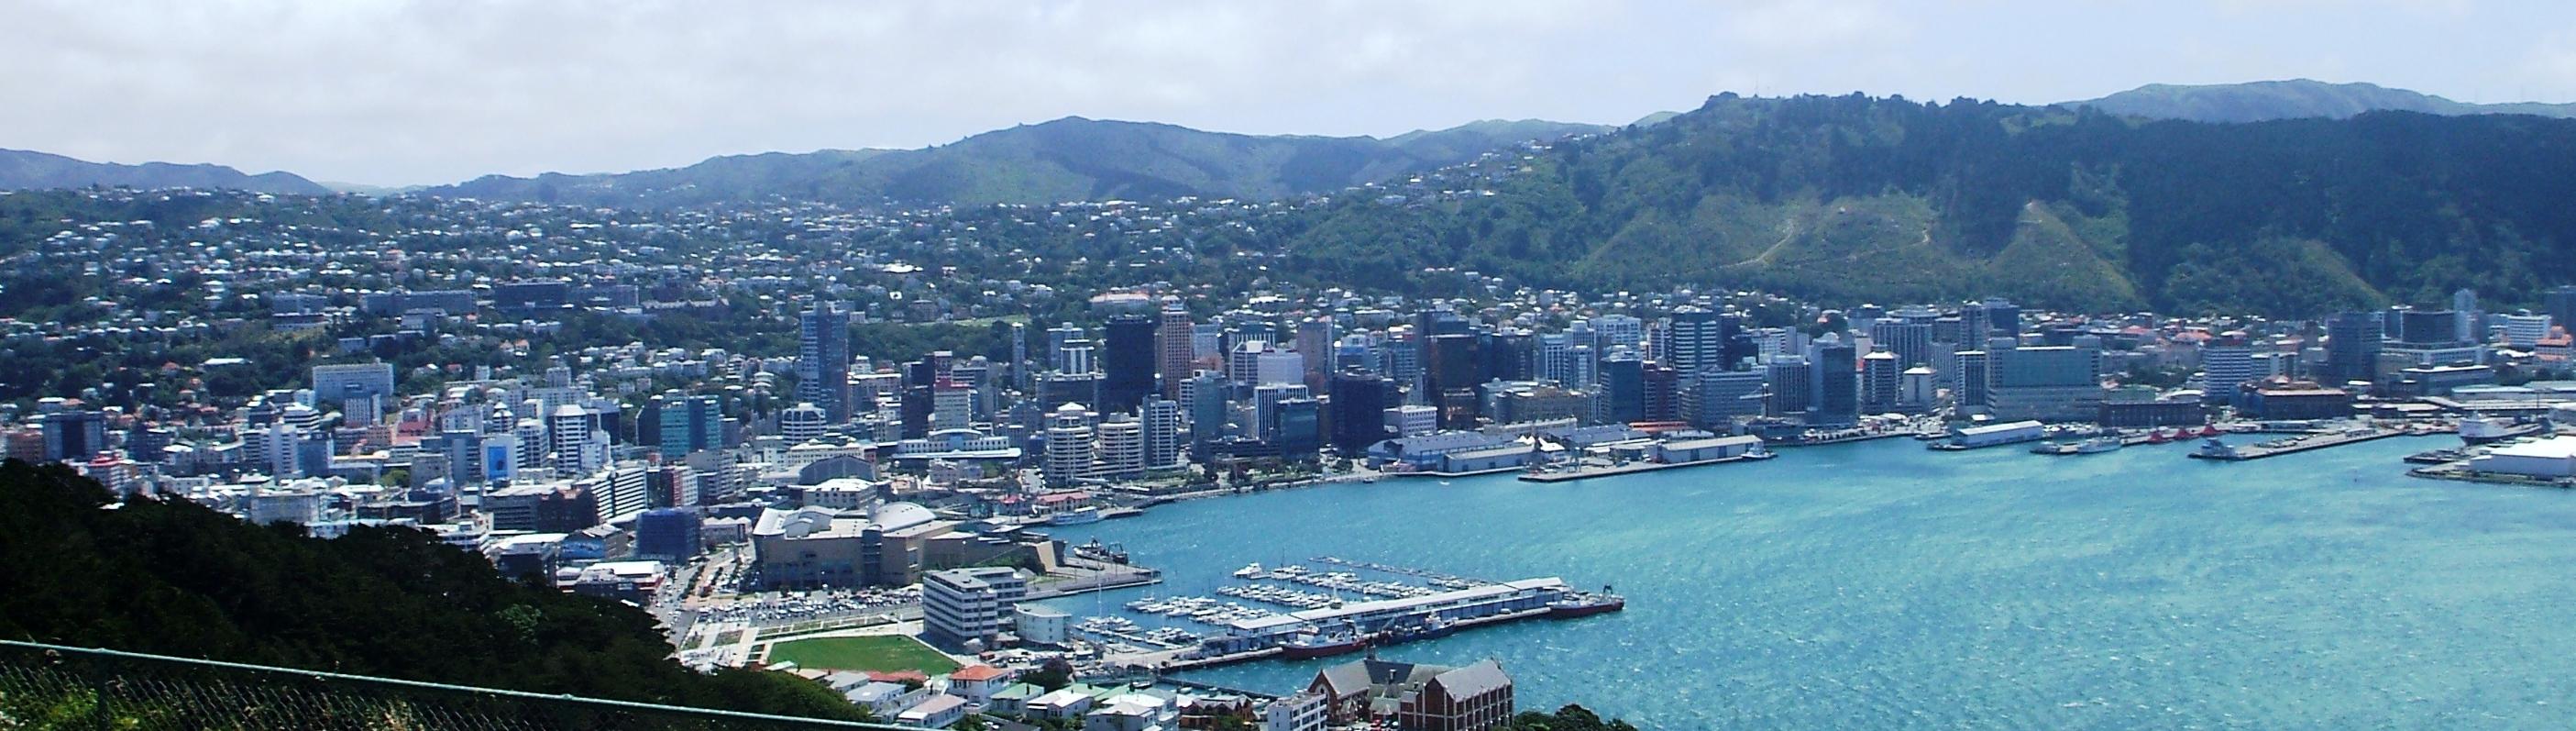 Sq Mt Sq Ft Wellington Familypedia Fandom Powered By Wikia